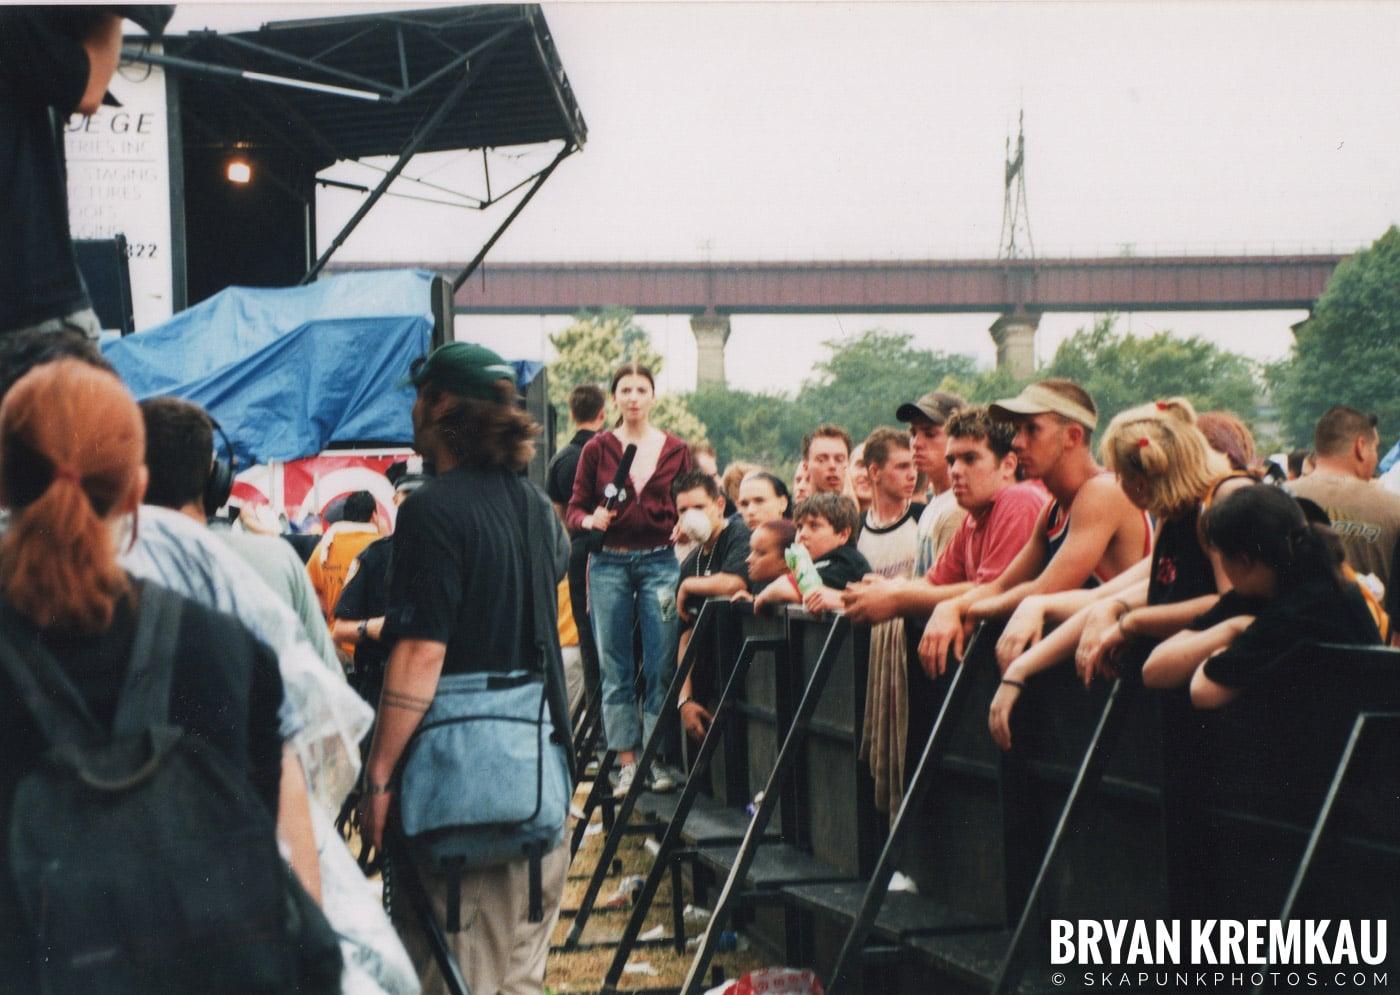 Crowd Shots @ Vans Warped Tour, Randall's Island, NYC - 8.4.01 (8)